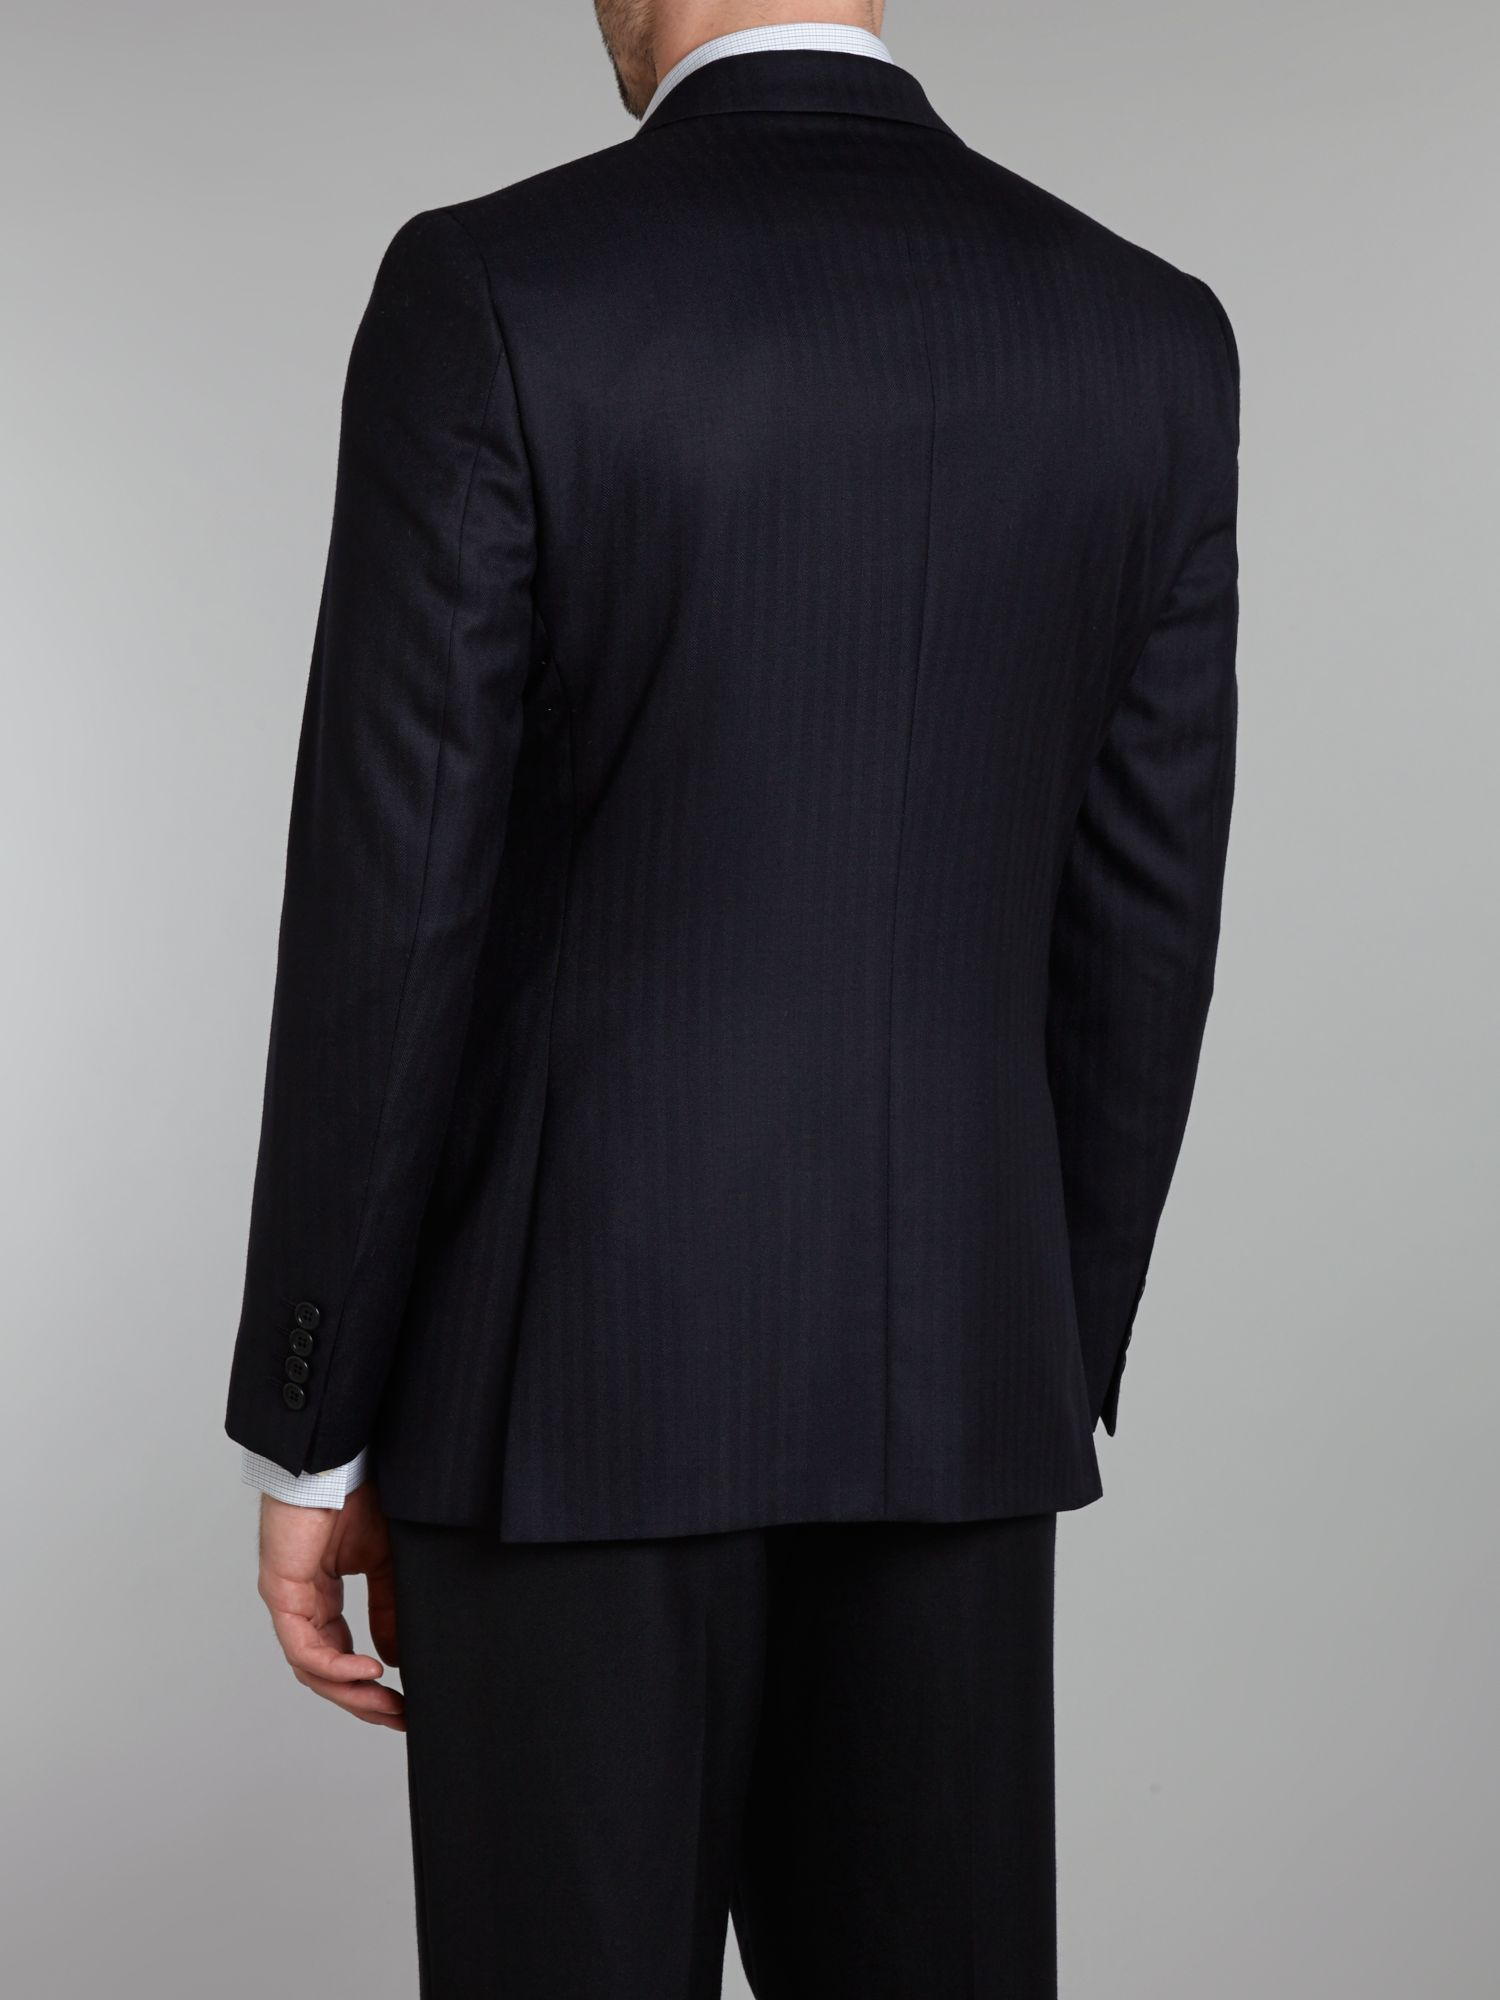 Aquascutum Pritchard Herringbone Jacket in Navy (Blue) for Men